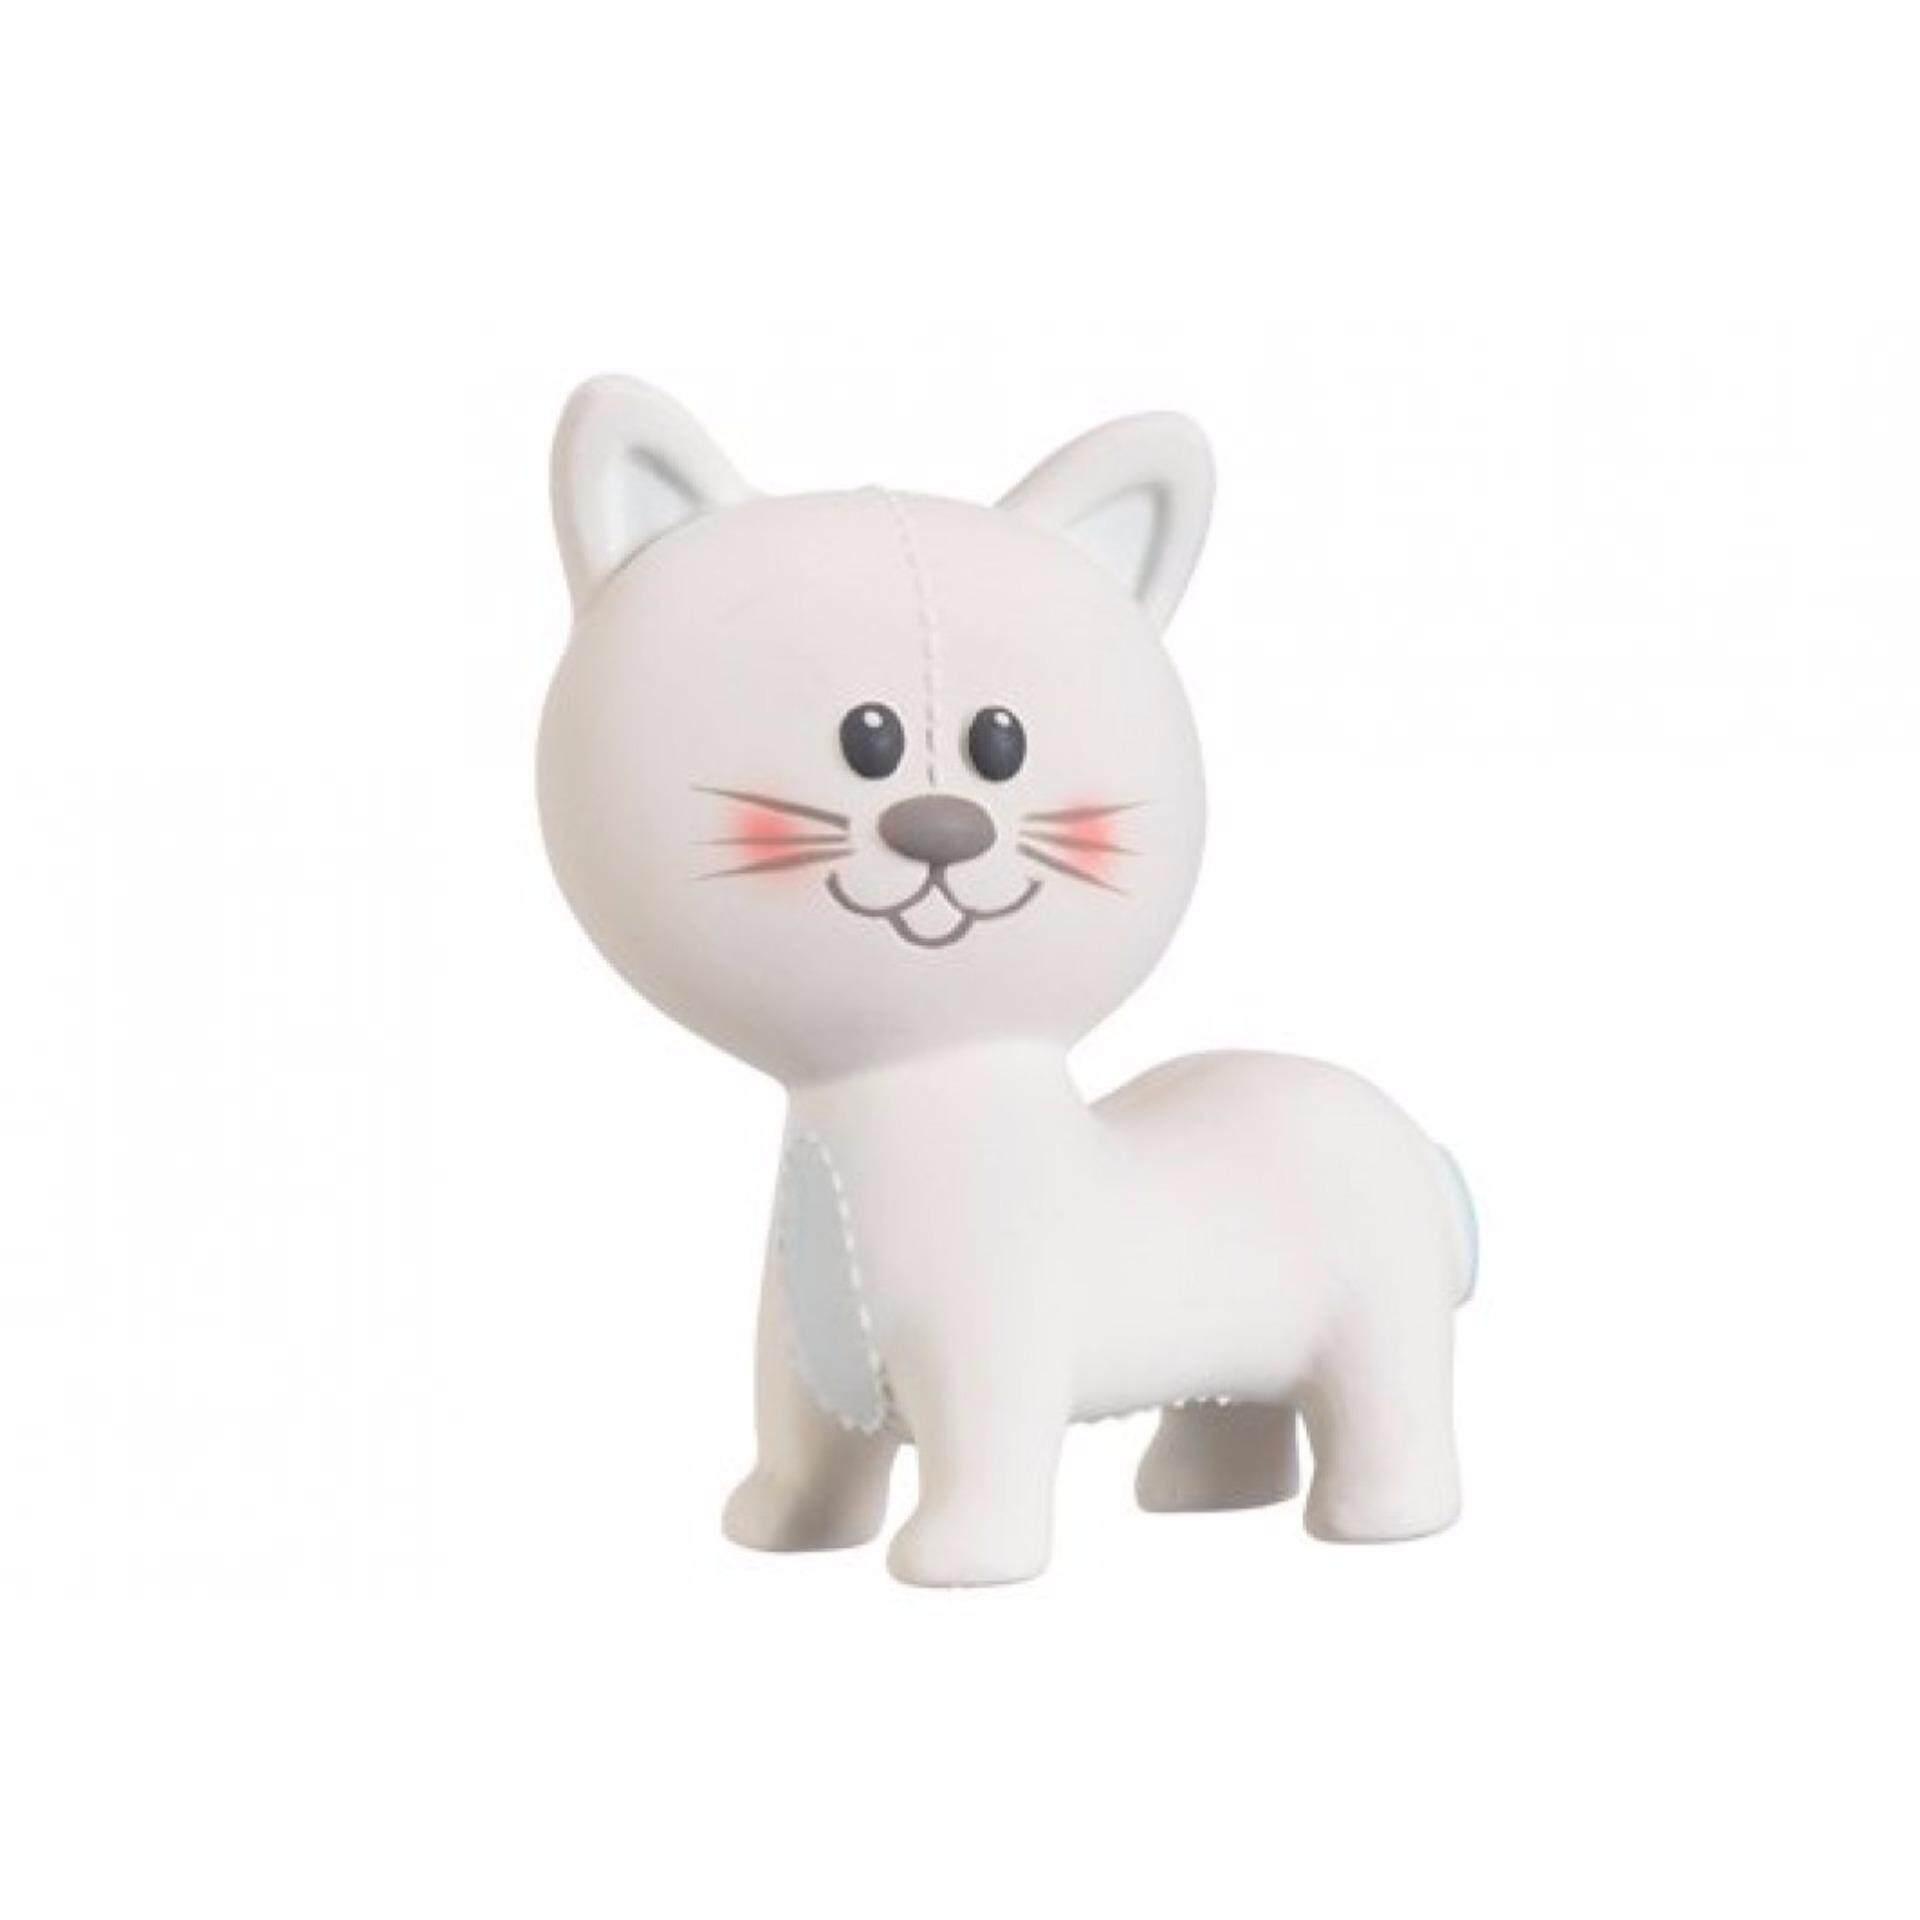 [FRANCE - SOPHIE LA GIRAFE] Lazare the Cat Teether (VULLI)